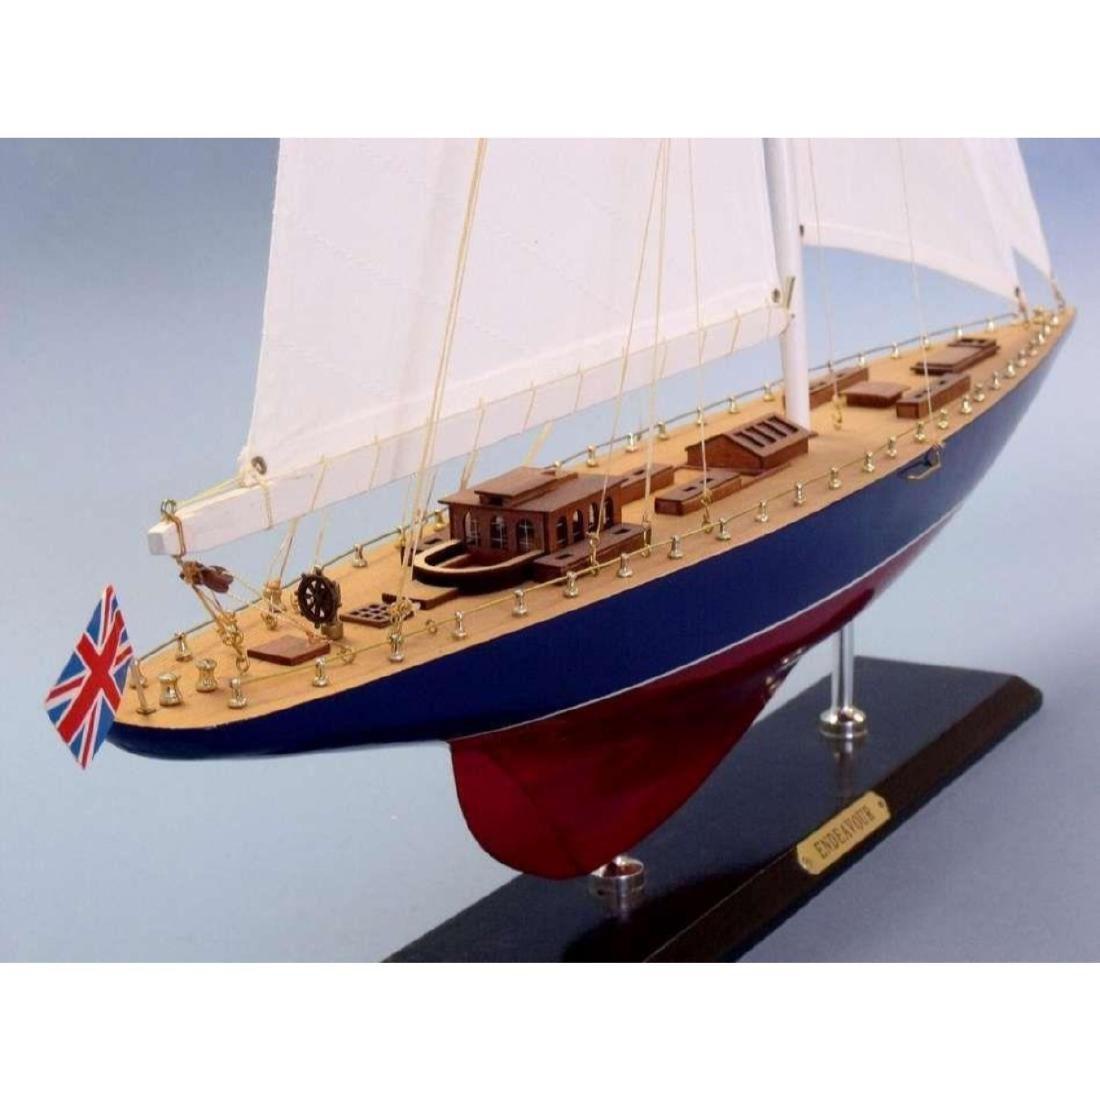 "Wooden Endeavour Limited Model Sailboat Decoration 35"" - 6"